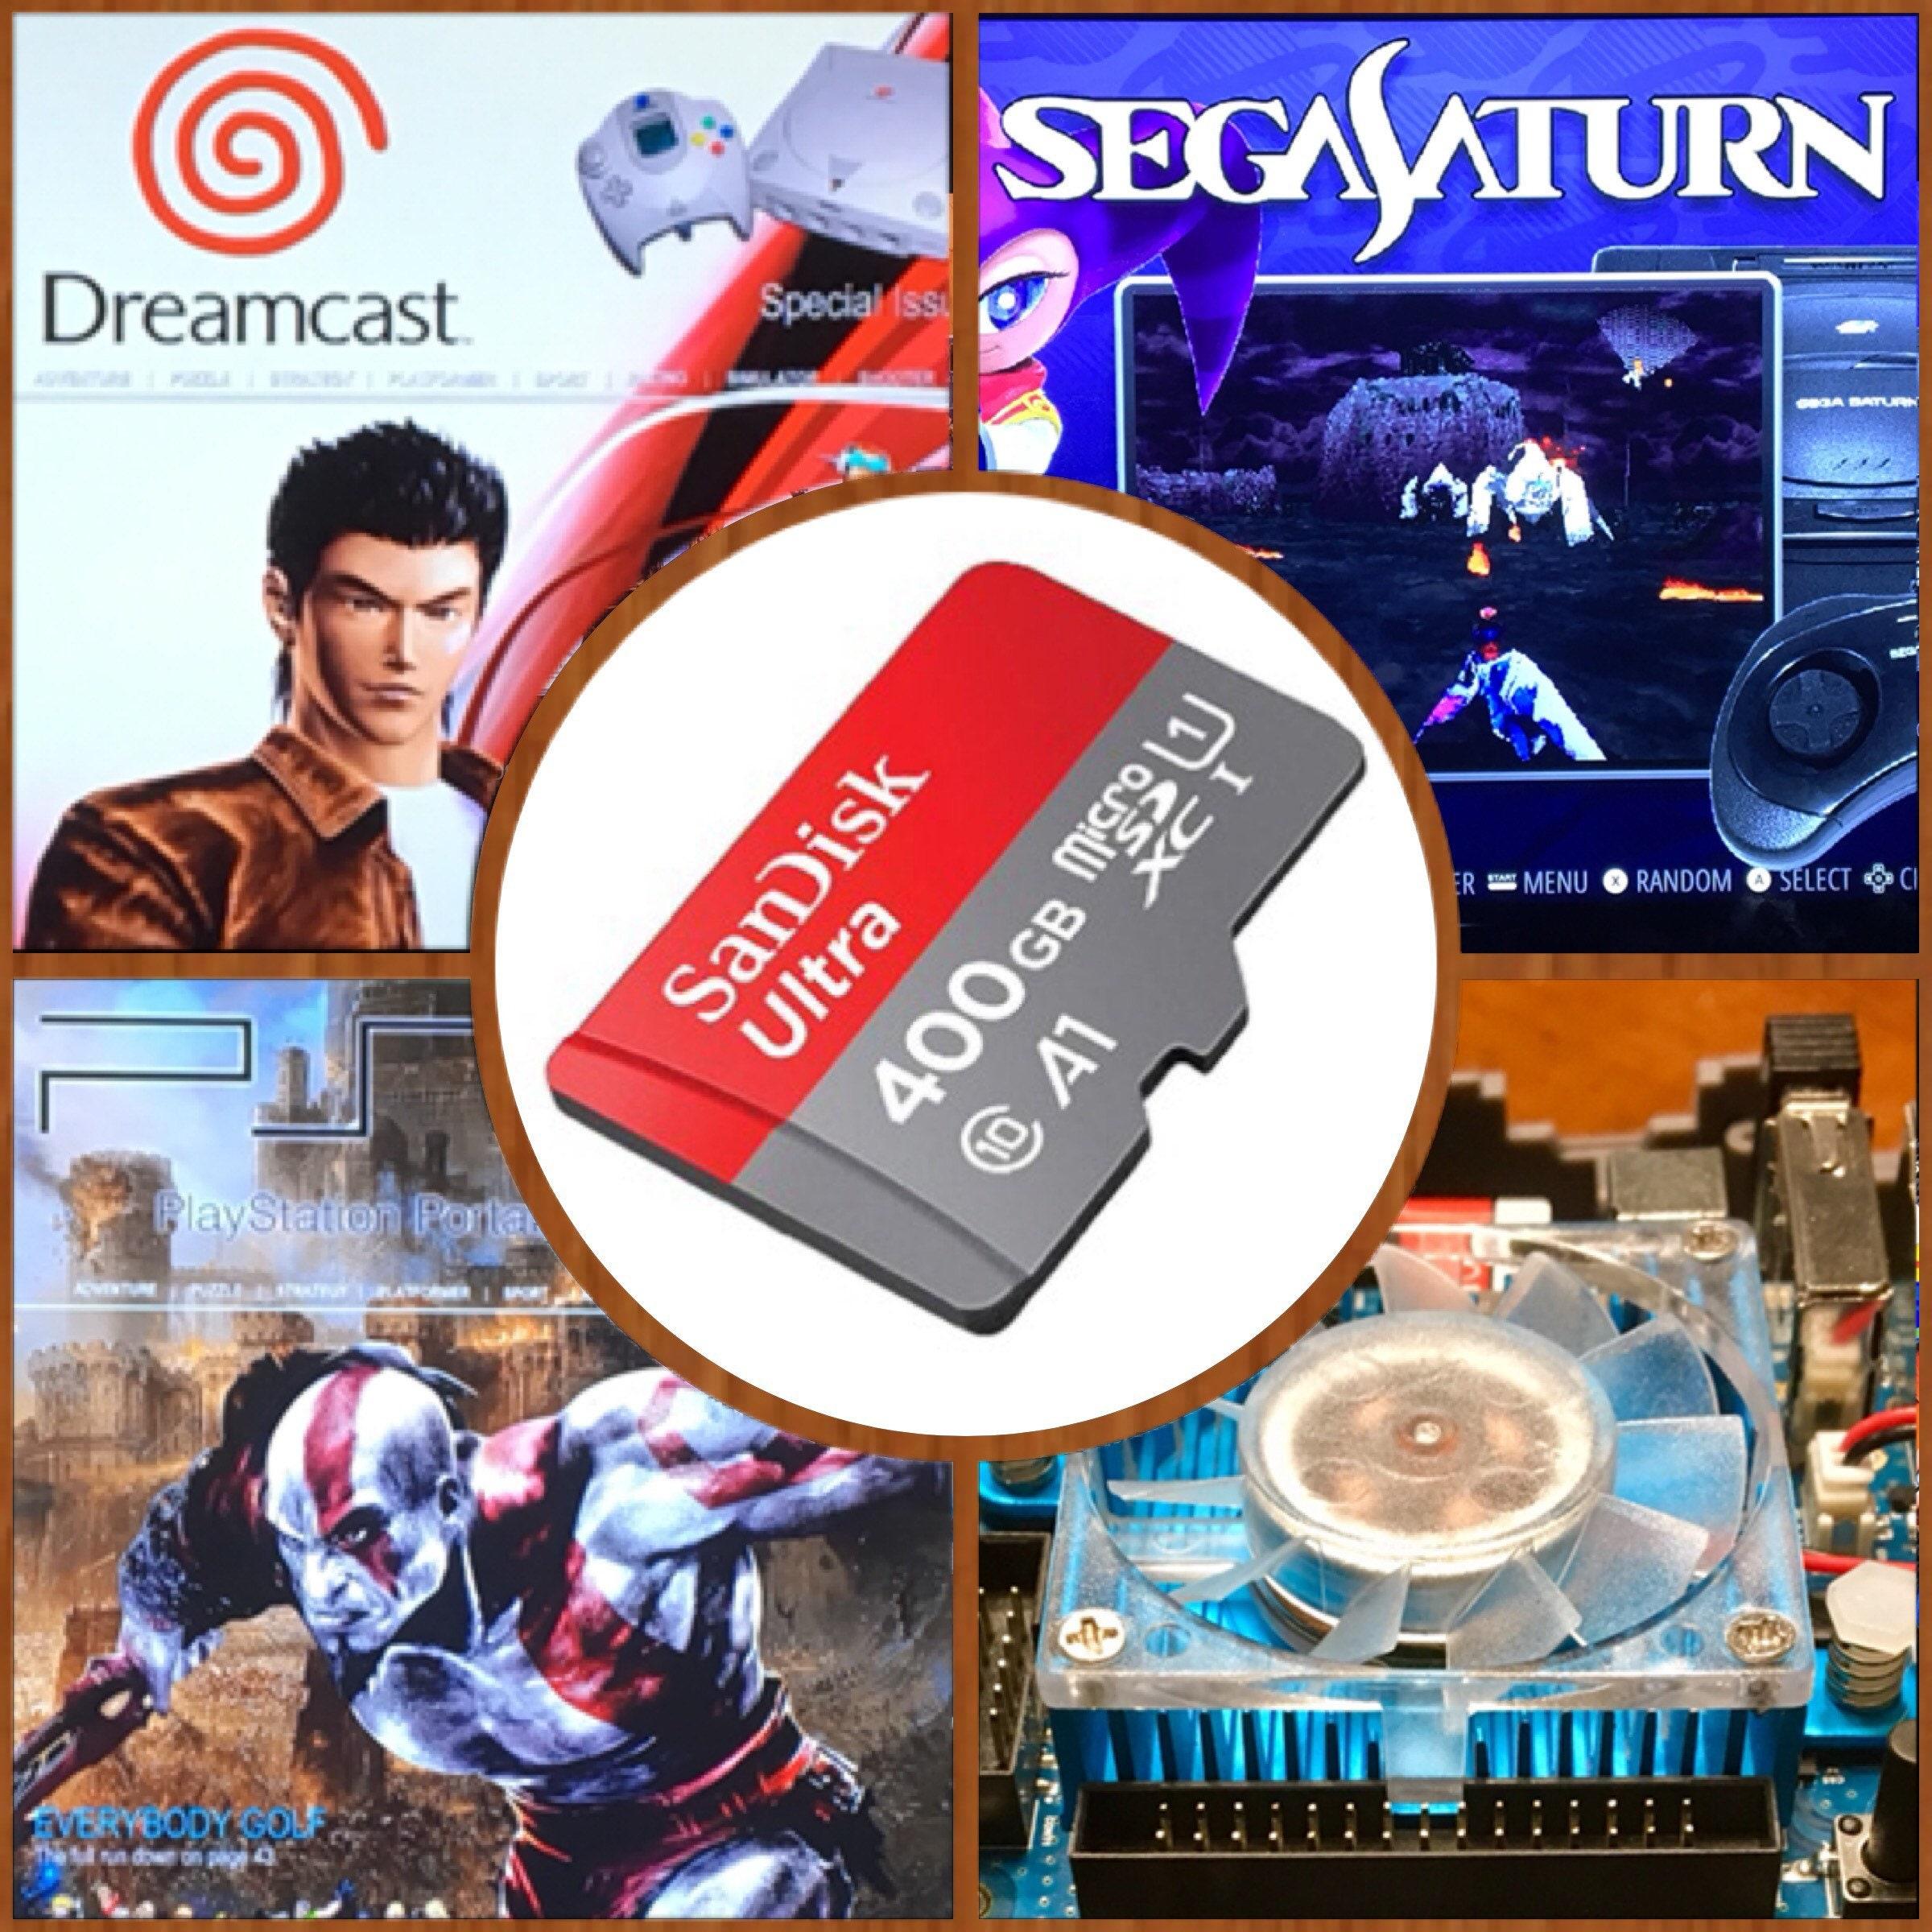 400 GB ODROID XU4, latest Ora v1 65 Retropie SD Card - Sega Saturn, Naomi,  Atomiswave    3D Boxart, Video Previews, brand-new build!!!